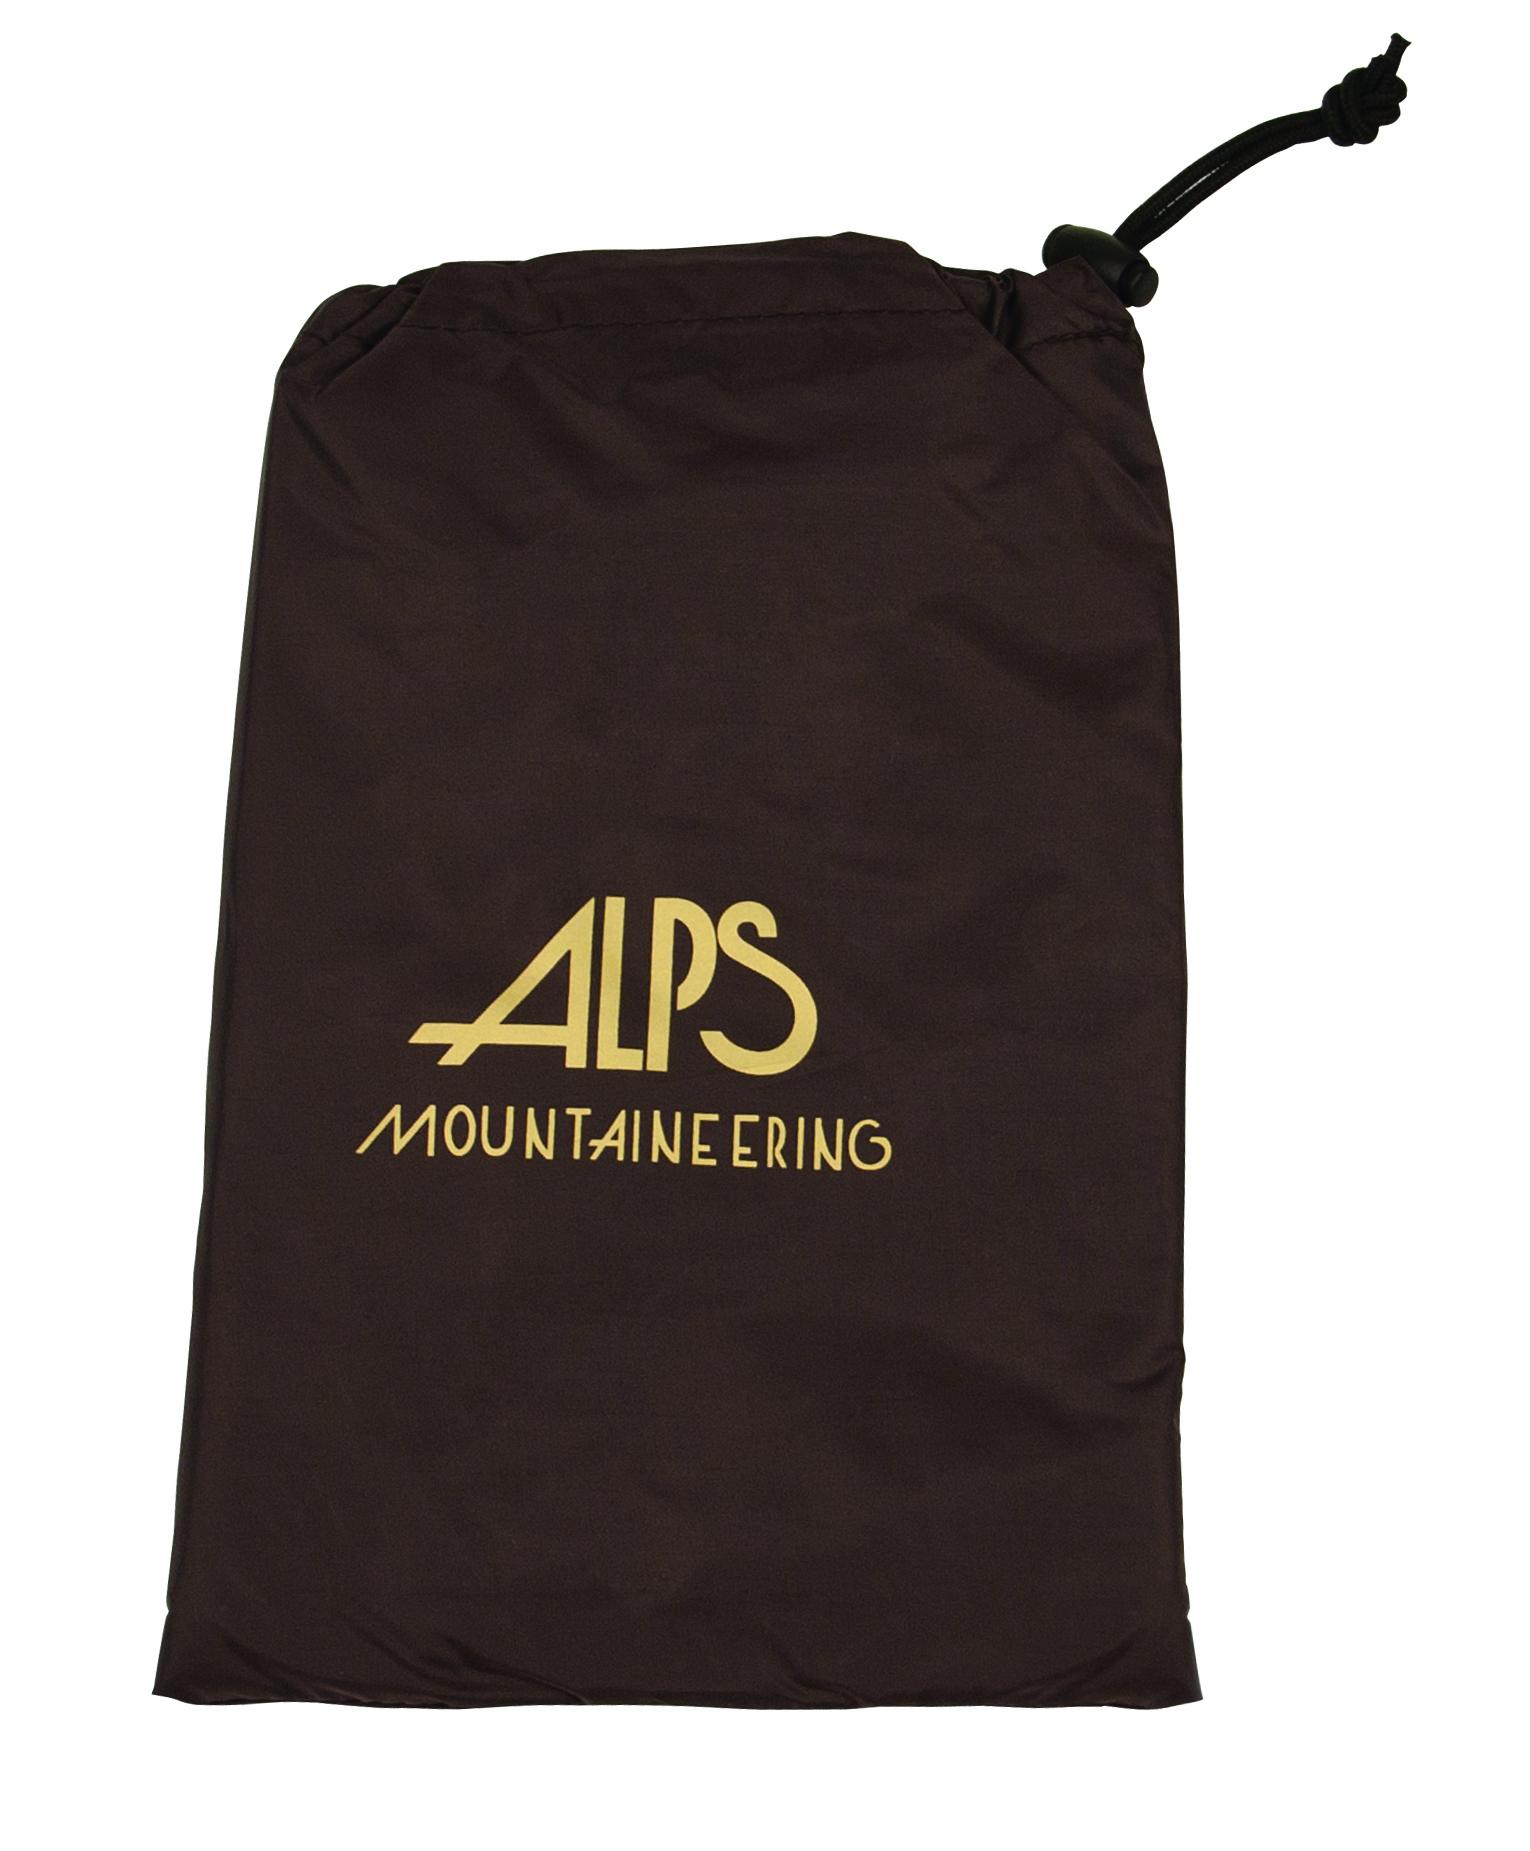 ALPS Mountaineering Aries 3 Floor Saver